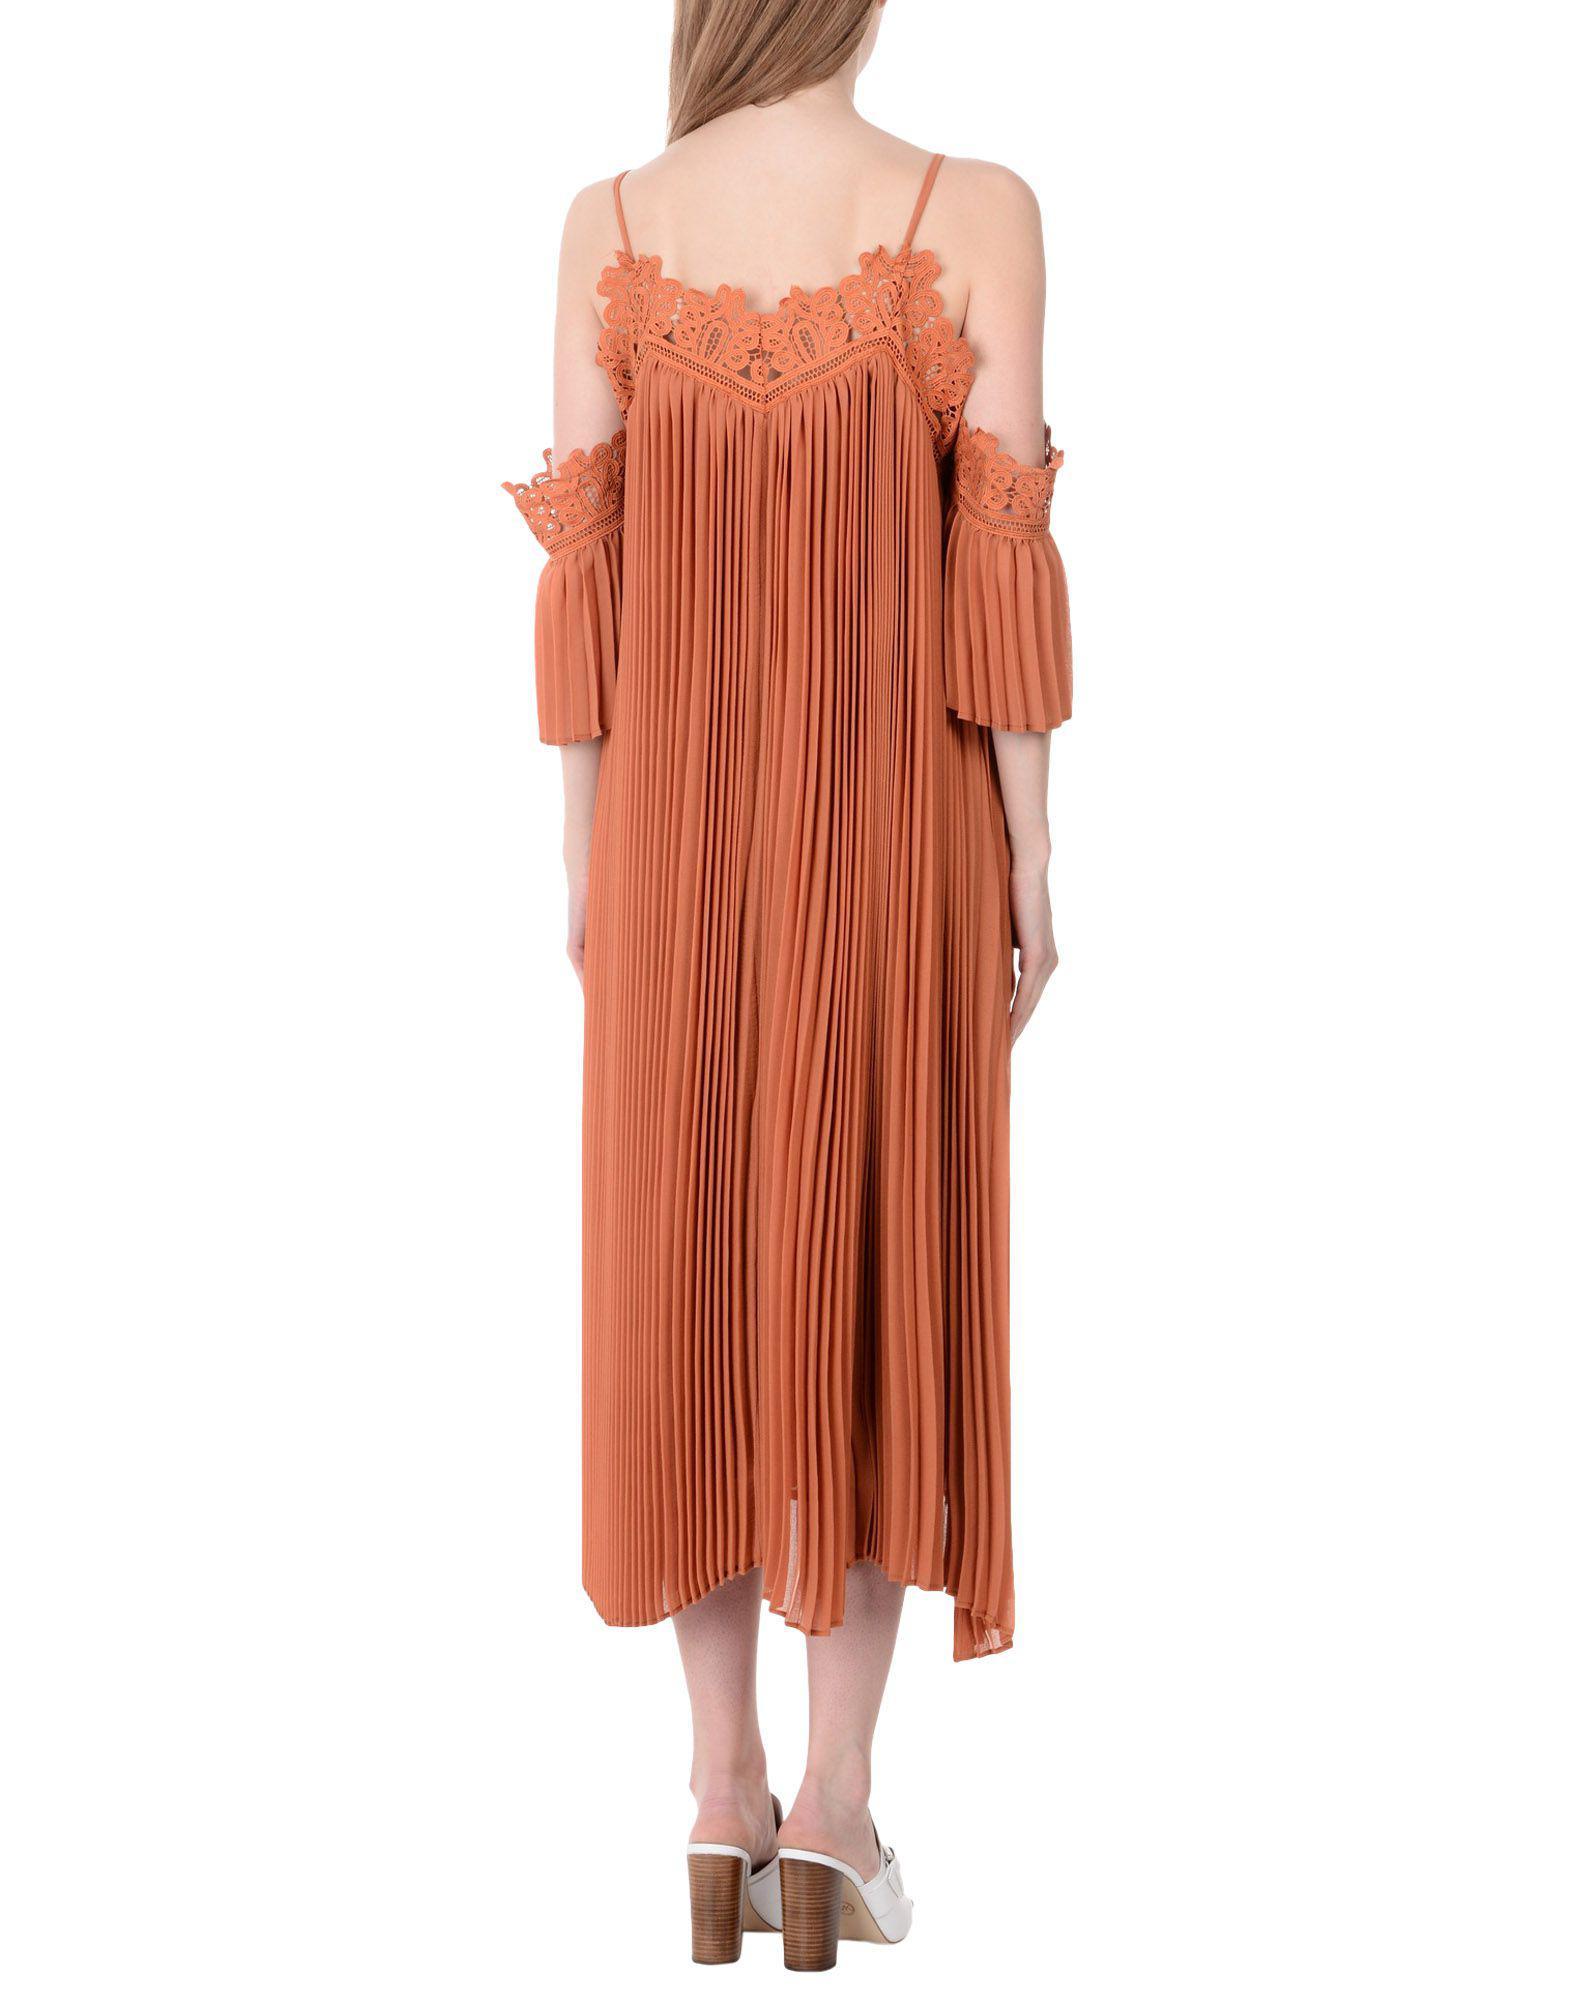 Length Dress Lyst Zheng 34 Weili 1RZYO